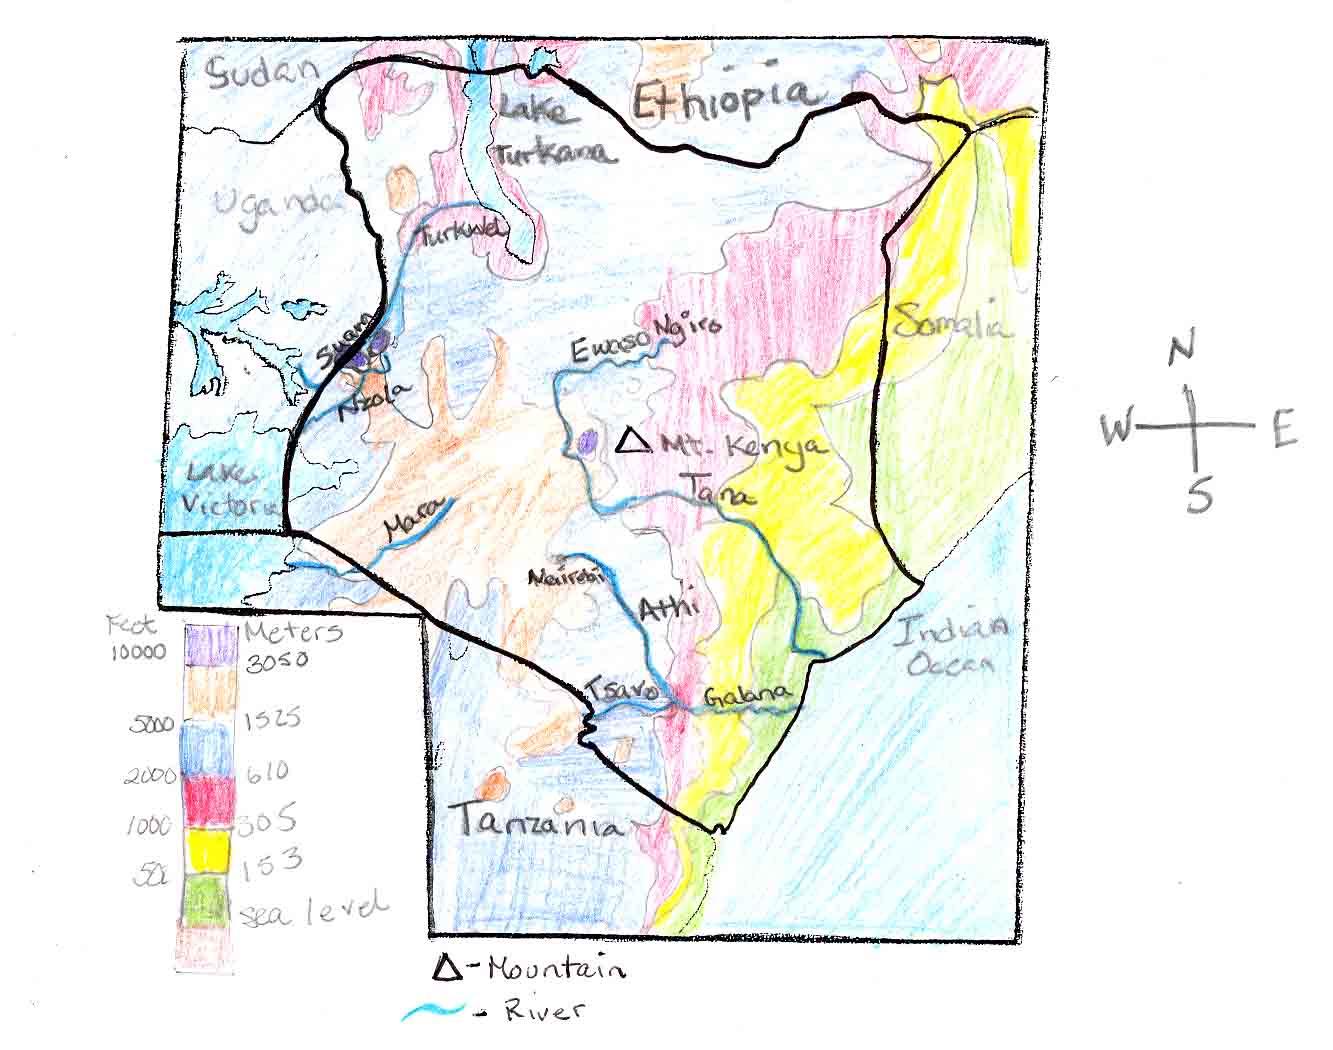 Ljhsjrichardson Licensed For Noncommercial Use Only Maps Of Kenya - Kenya rivers map